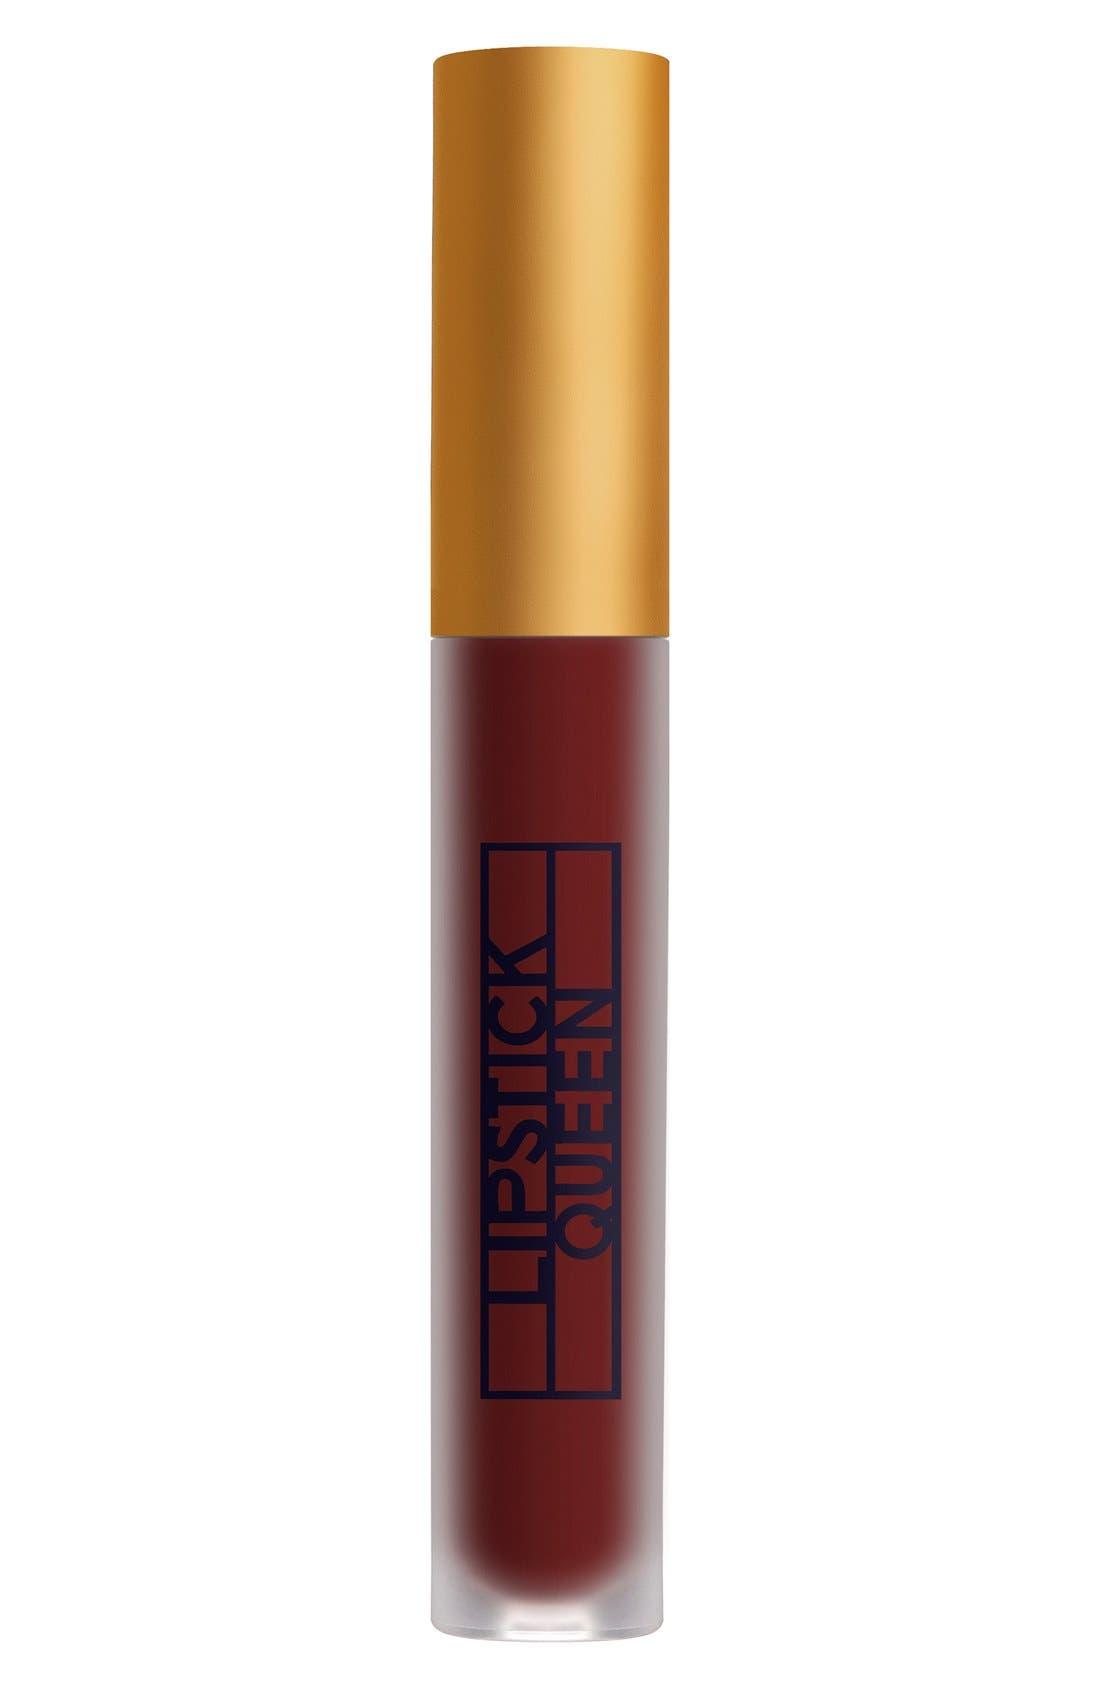 SPACE.NK.apothecary Lipstick Queen Saint & Sinner Lip Tint